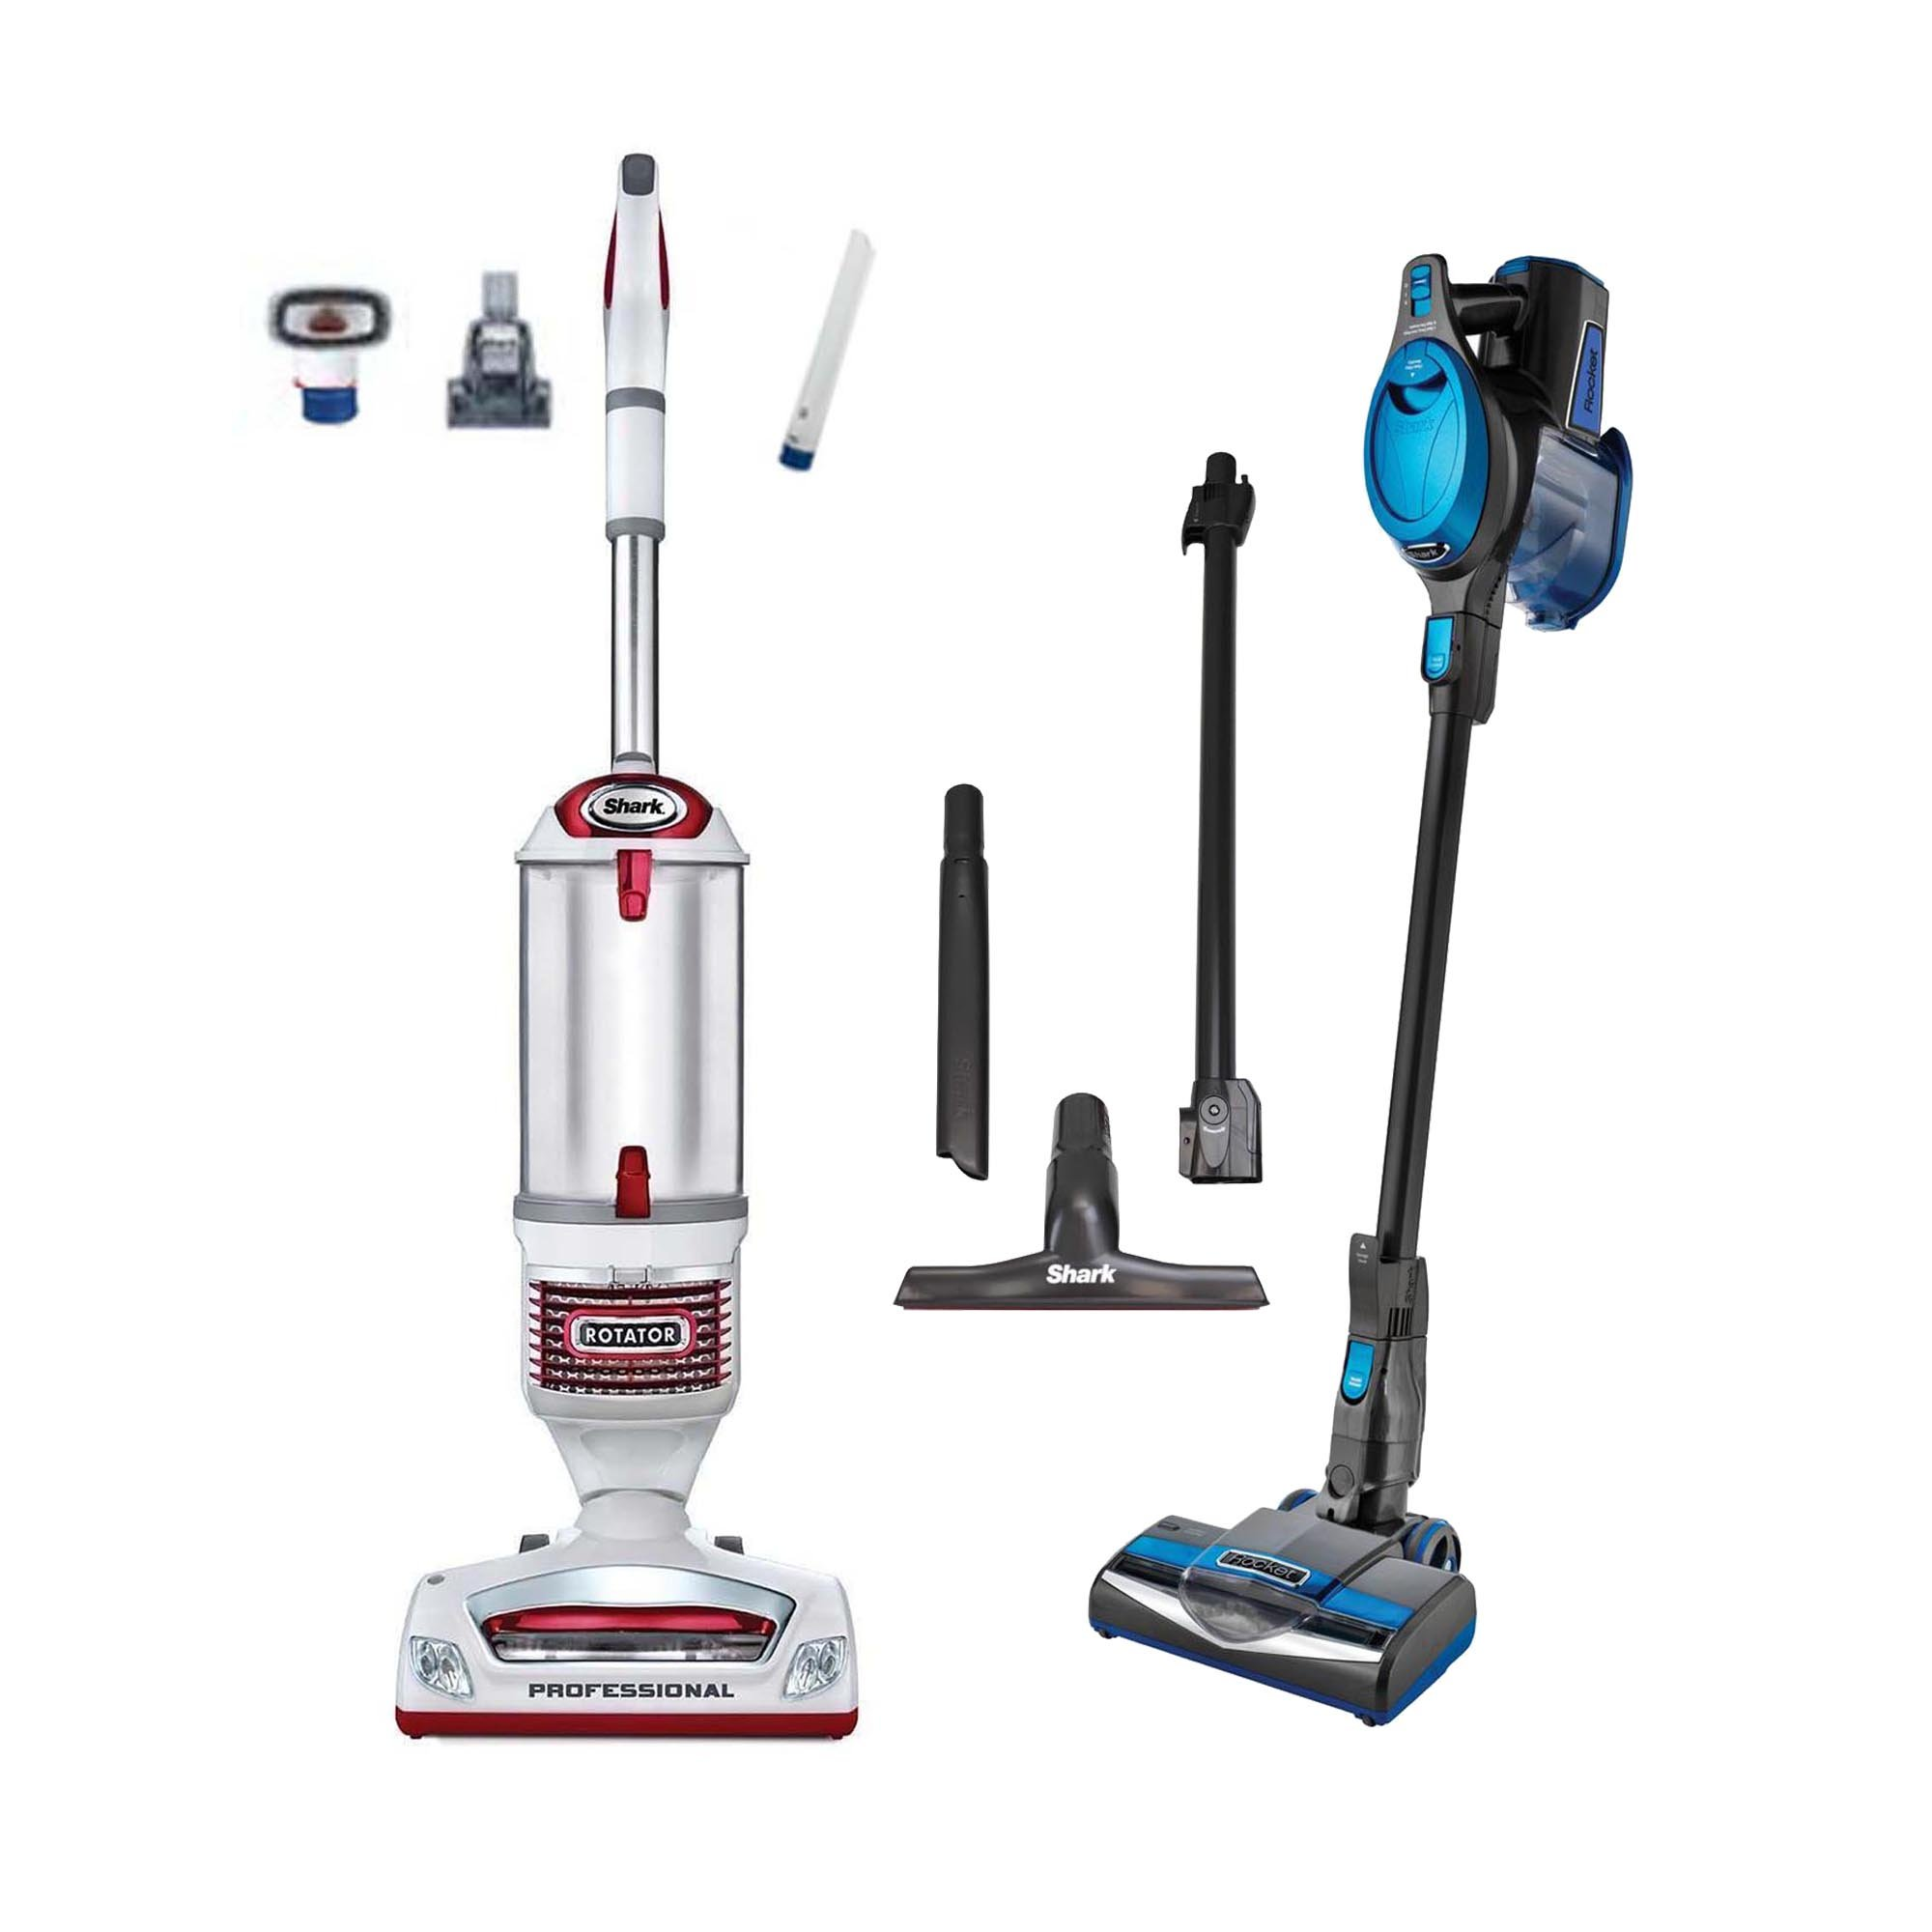 Shark Rotator Pro Lift-Away Vacuum + Rocket Light Vac (Certified Refurbished)